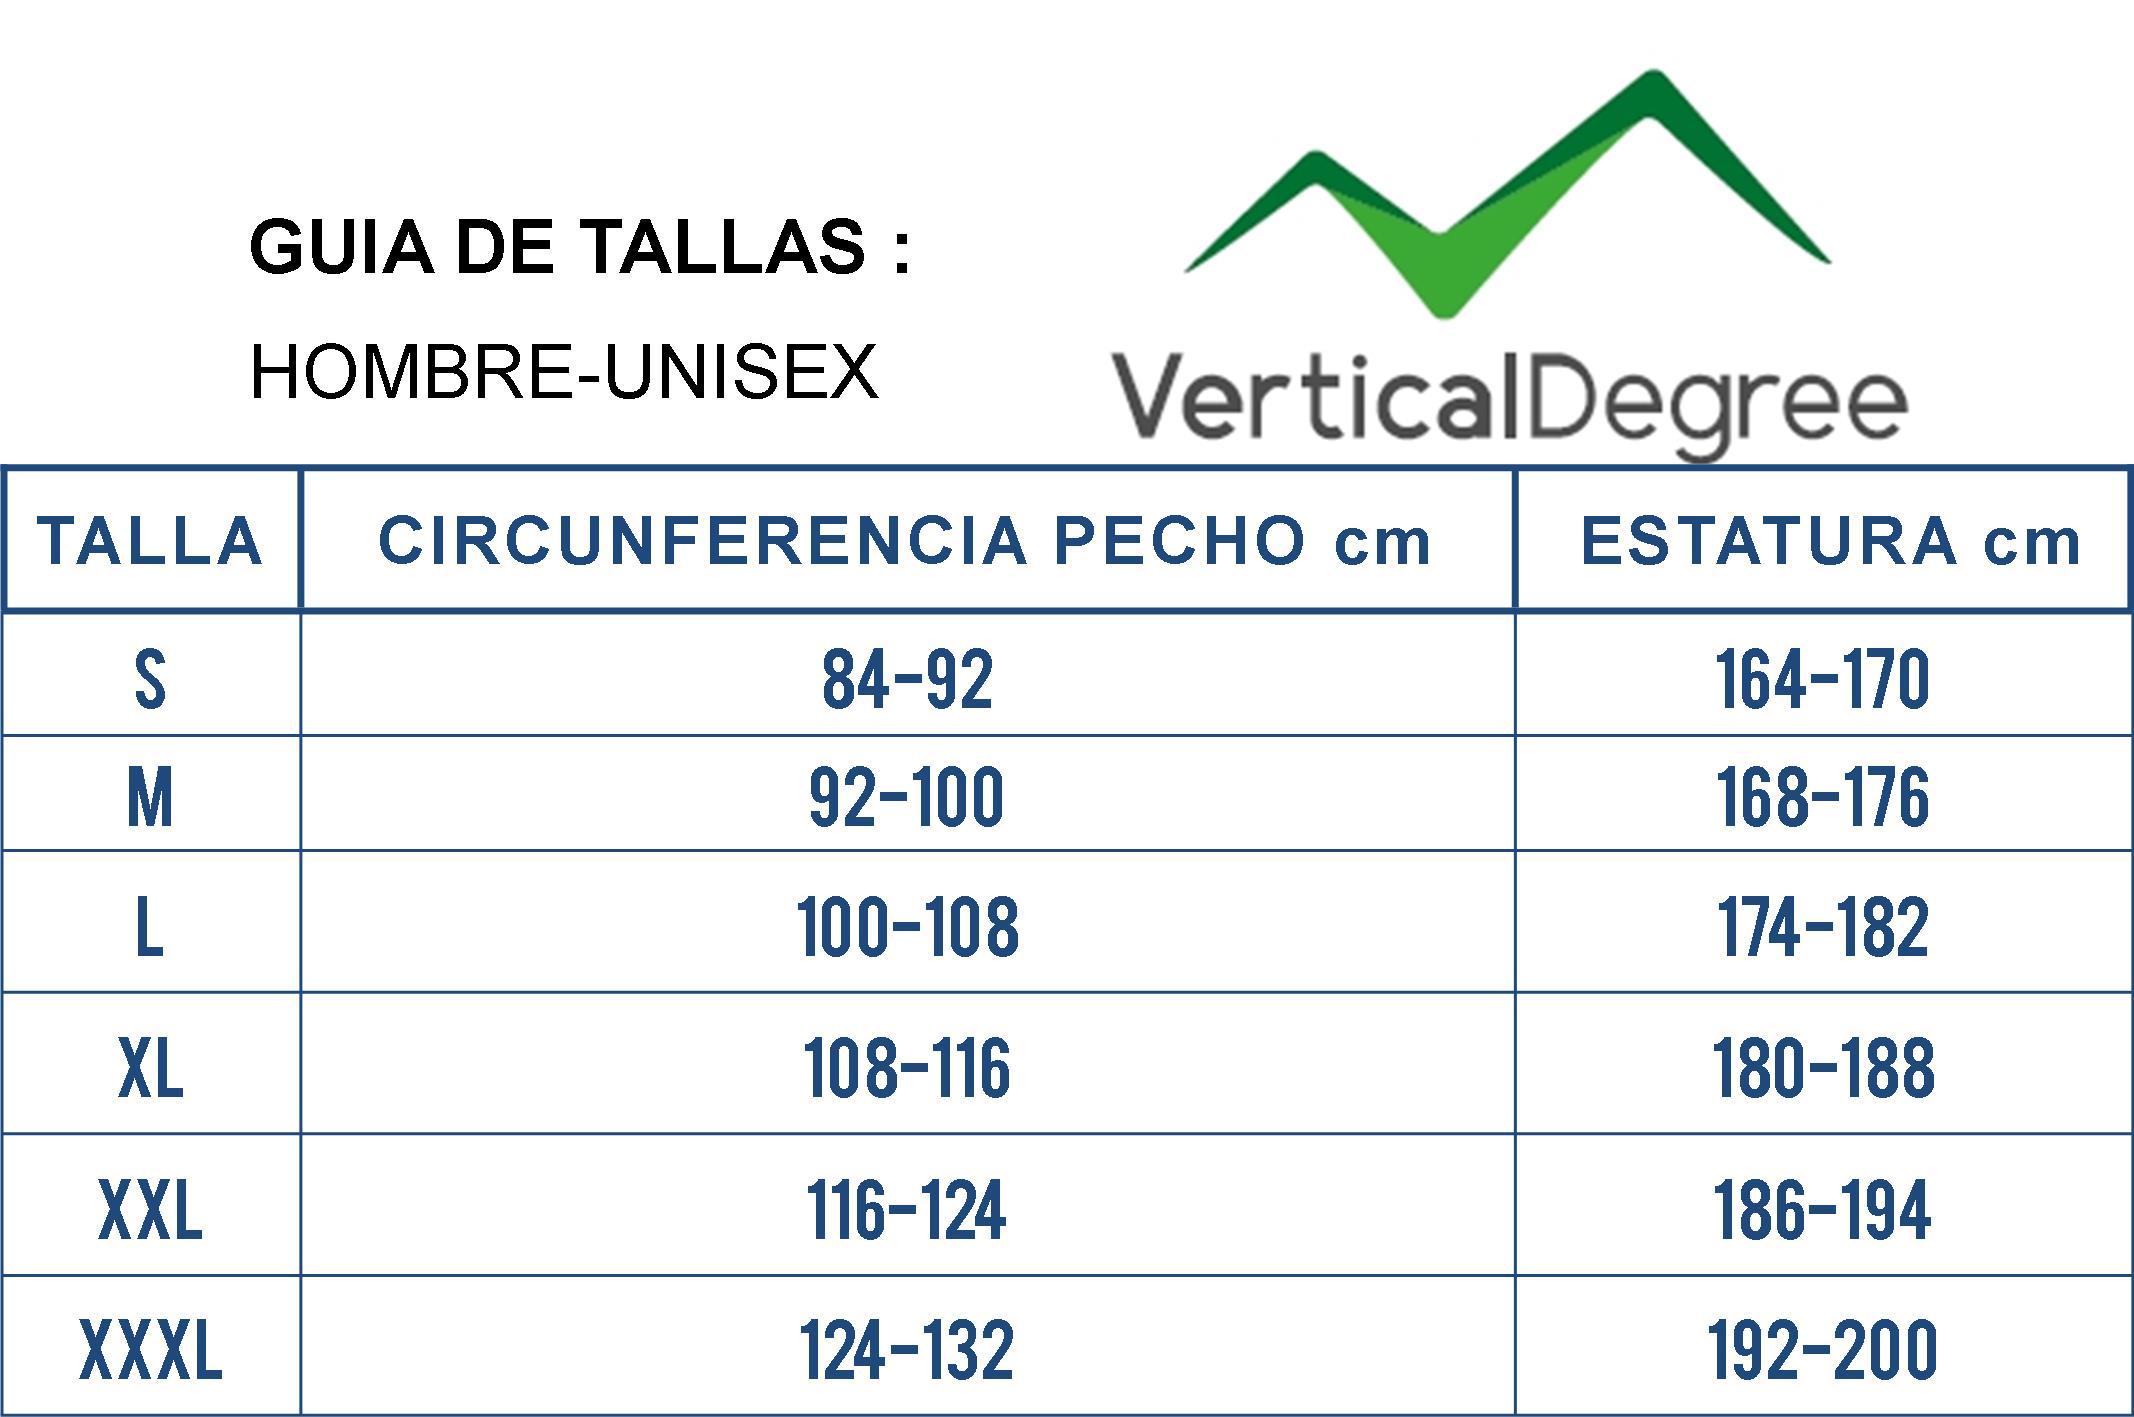 GUIA DE TALLAS HOMBRE VERTICAL DEGREE